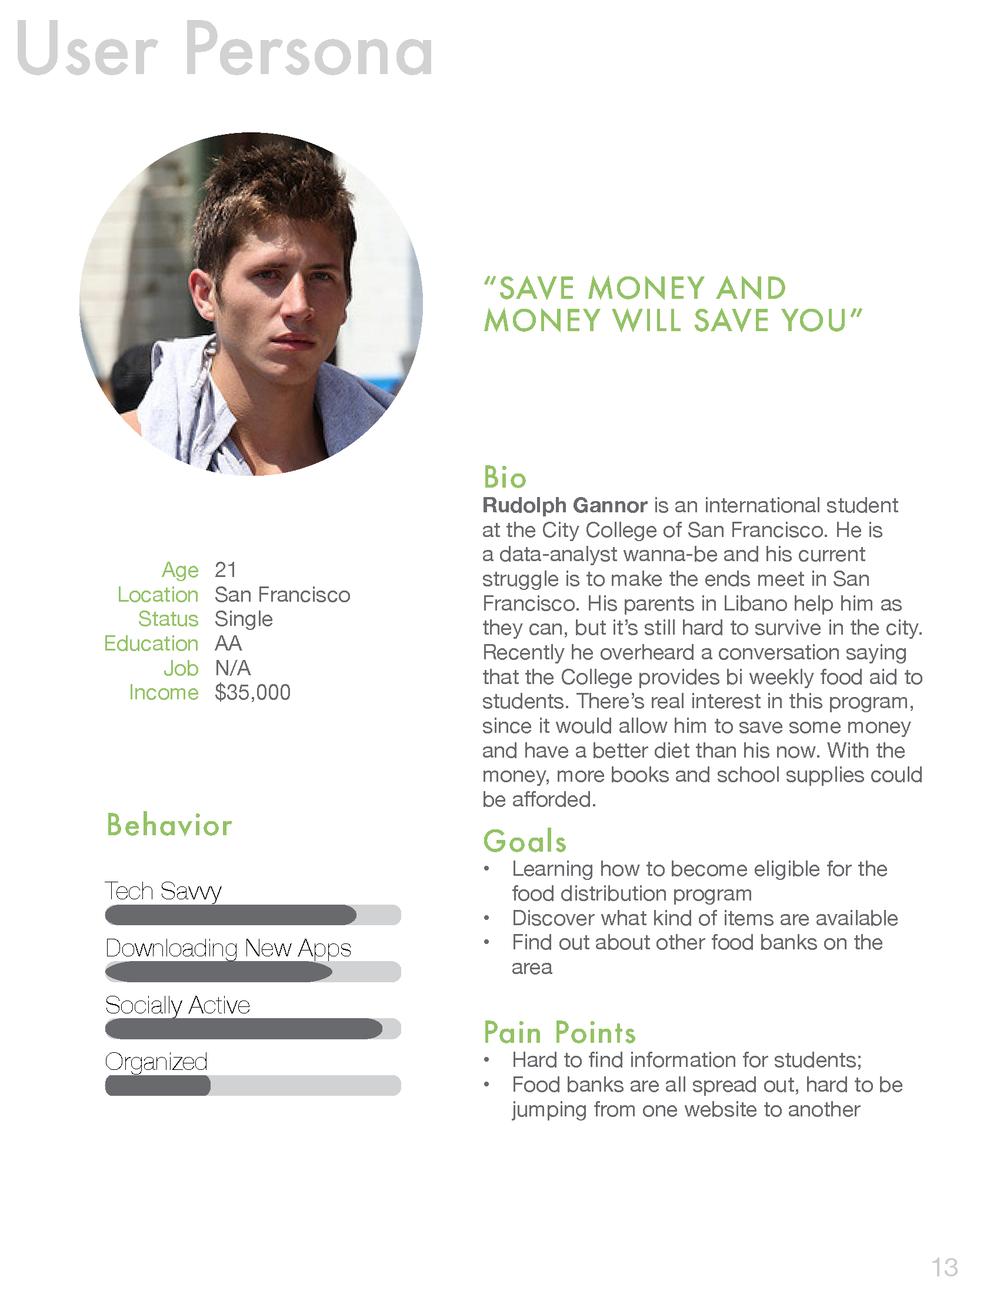 UX food bank app_Page_13.png